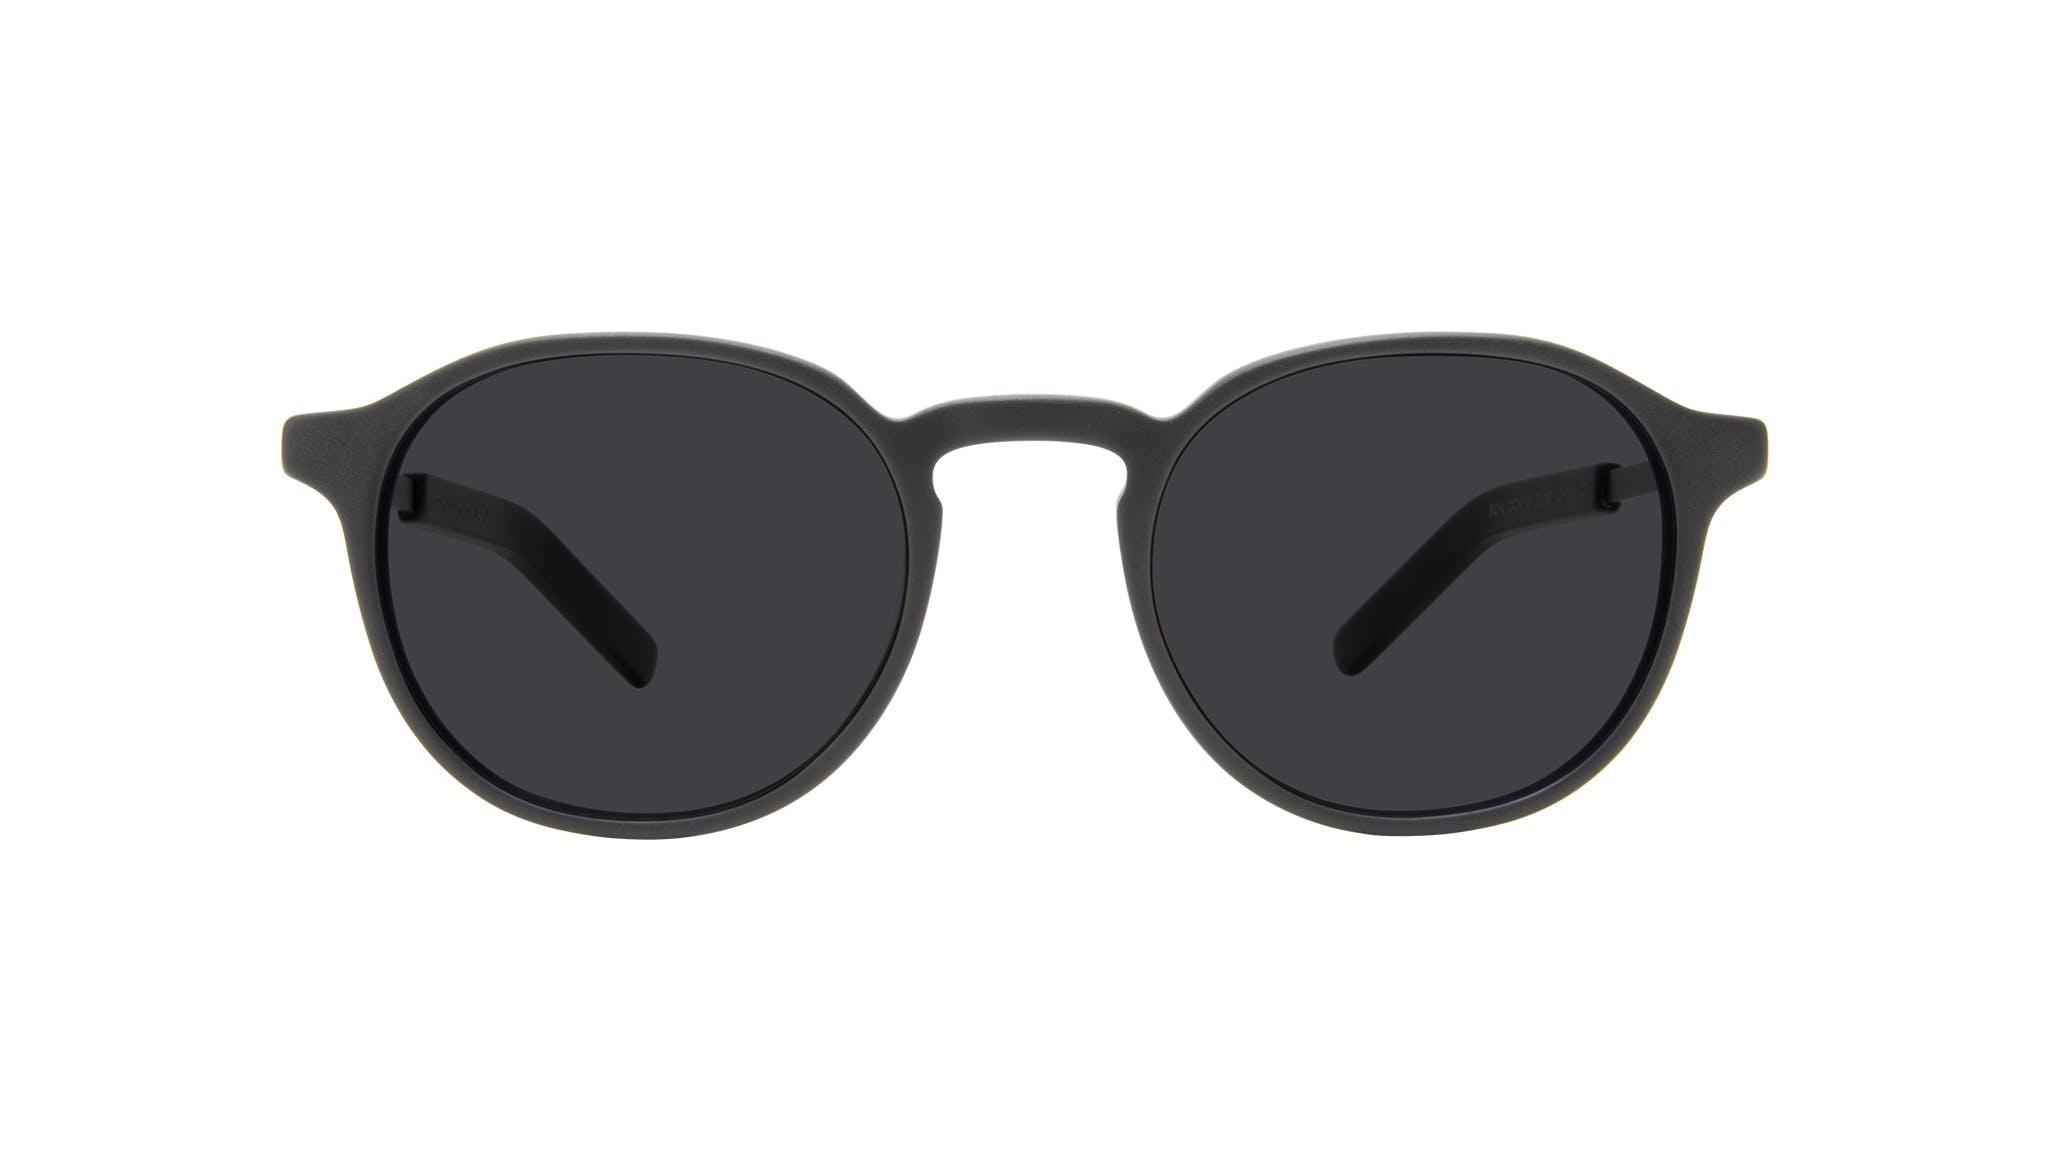 Affordable Fashion Glasses Round Eyeglasses Men Prime XL Matte Black